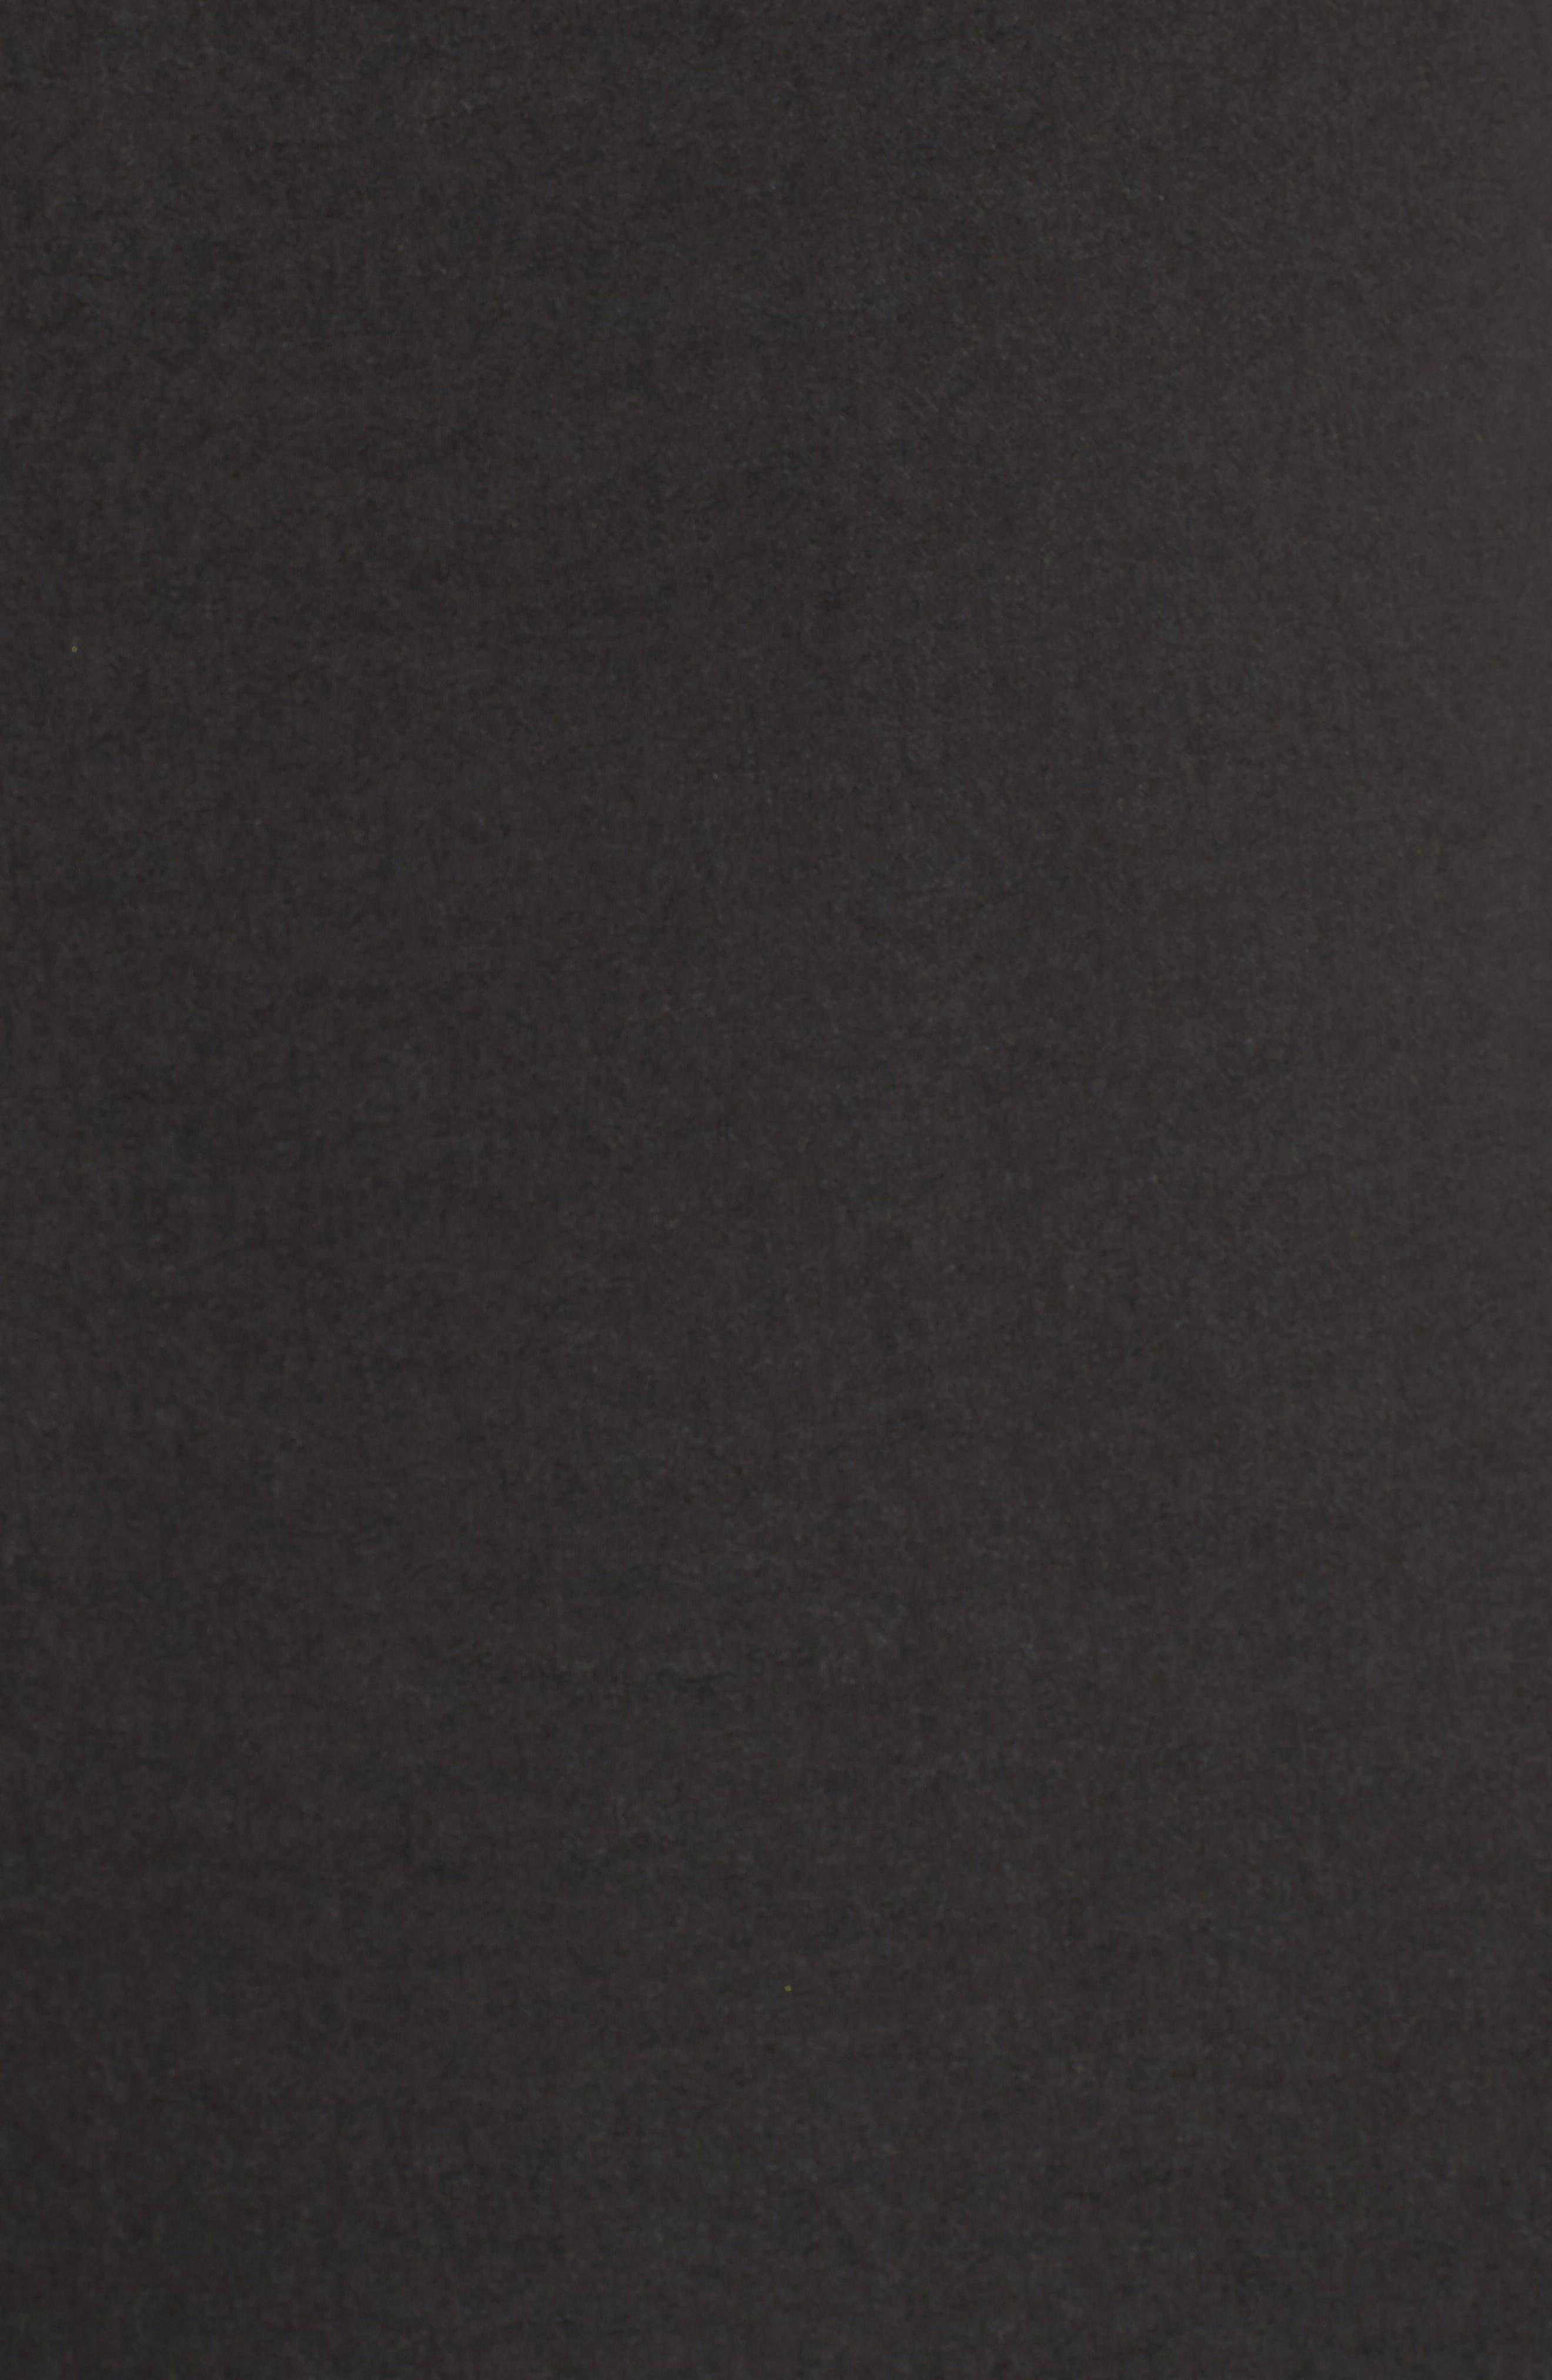 Satin Ruffle One-Shoulder Top,                             Alternate thumbnail 6, color,                             Black